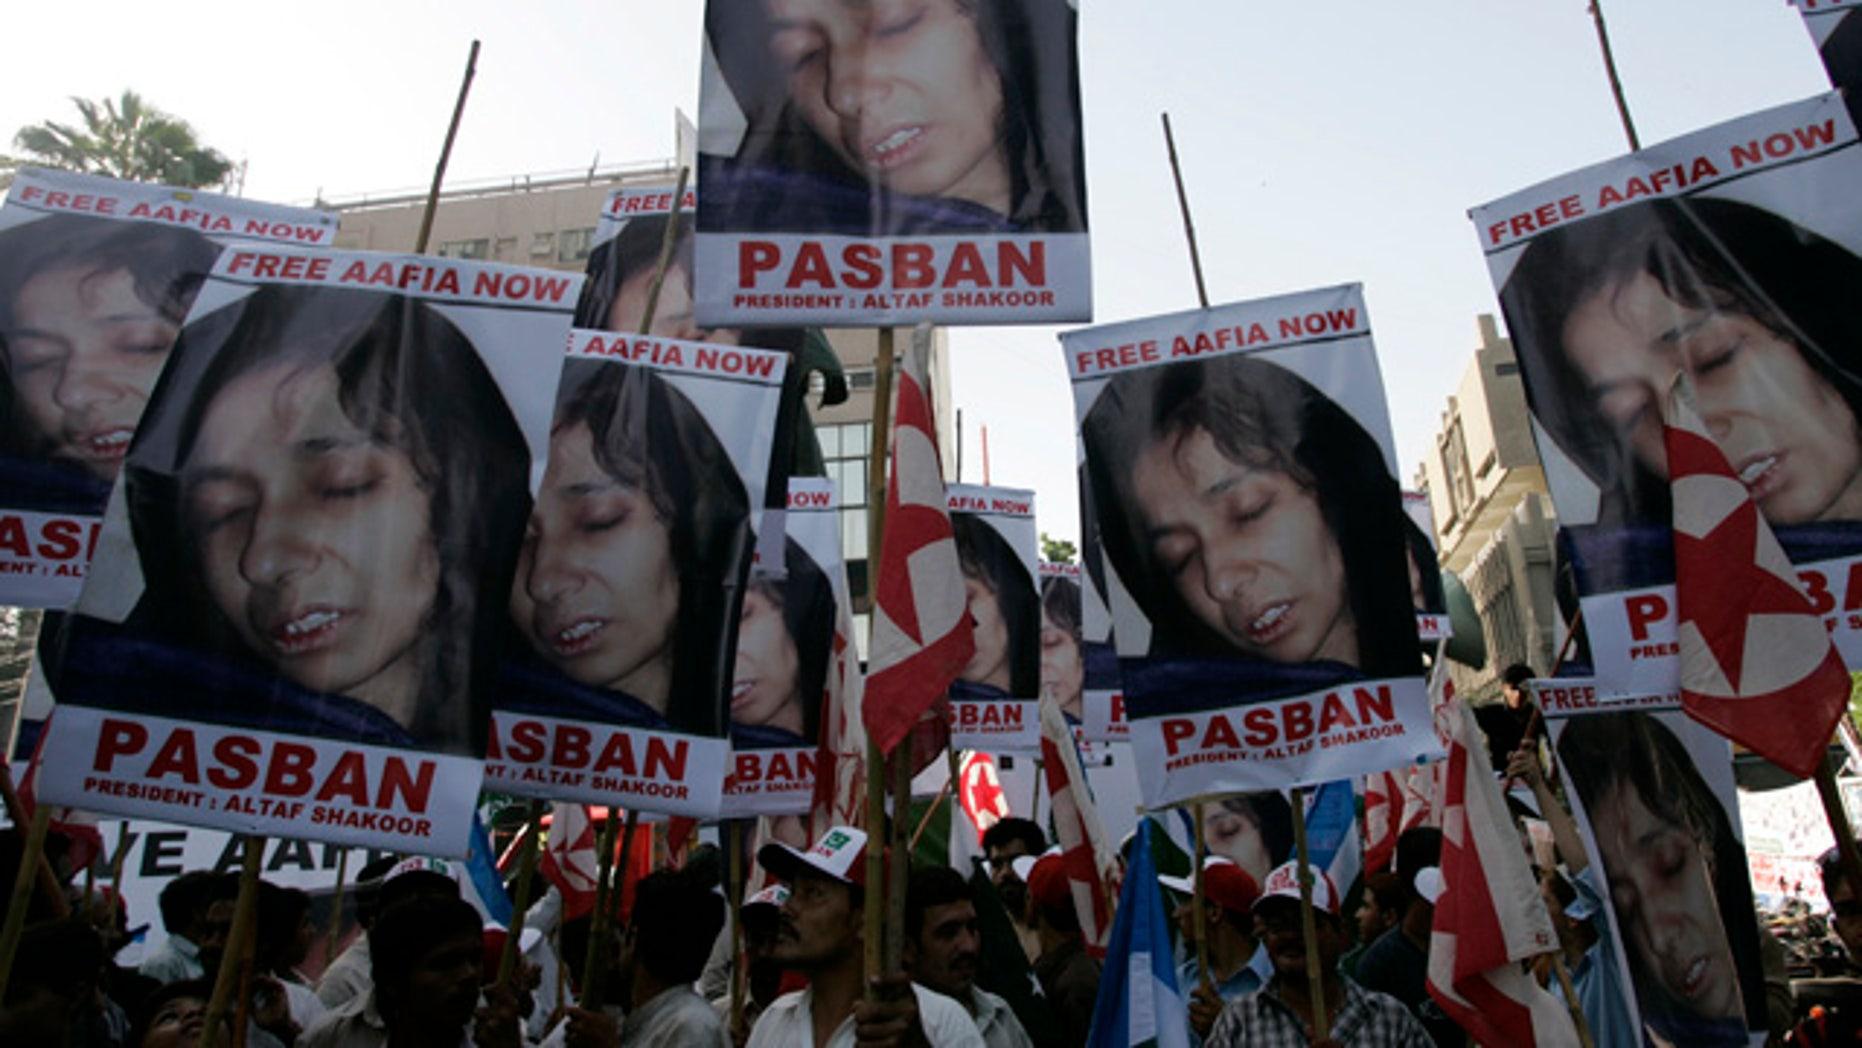 Sept. 23: Pakistani protesters rally near to condemn the arrest of alleged Al Qaeda suspect Aafia Siddiqui.